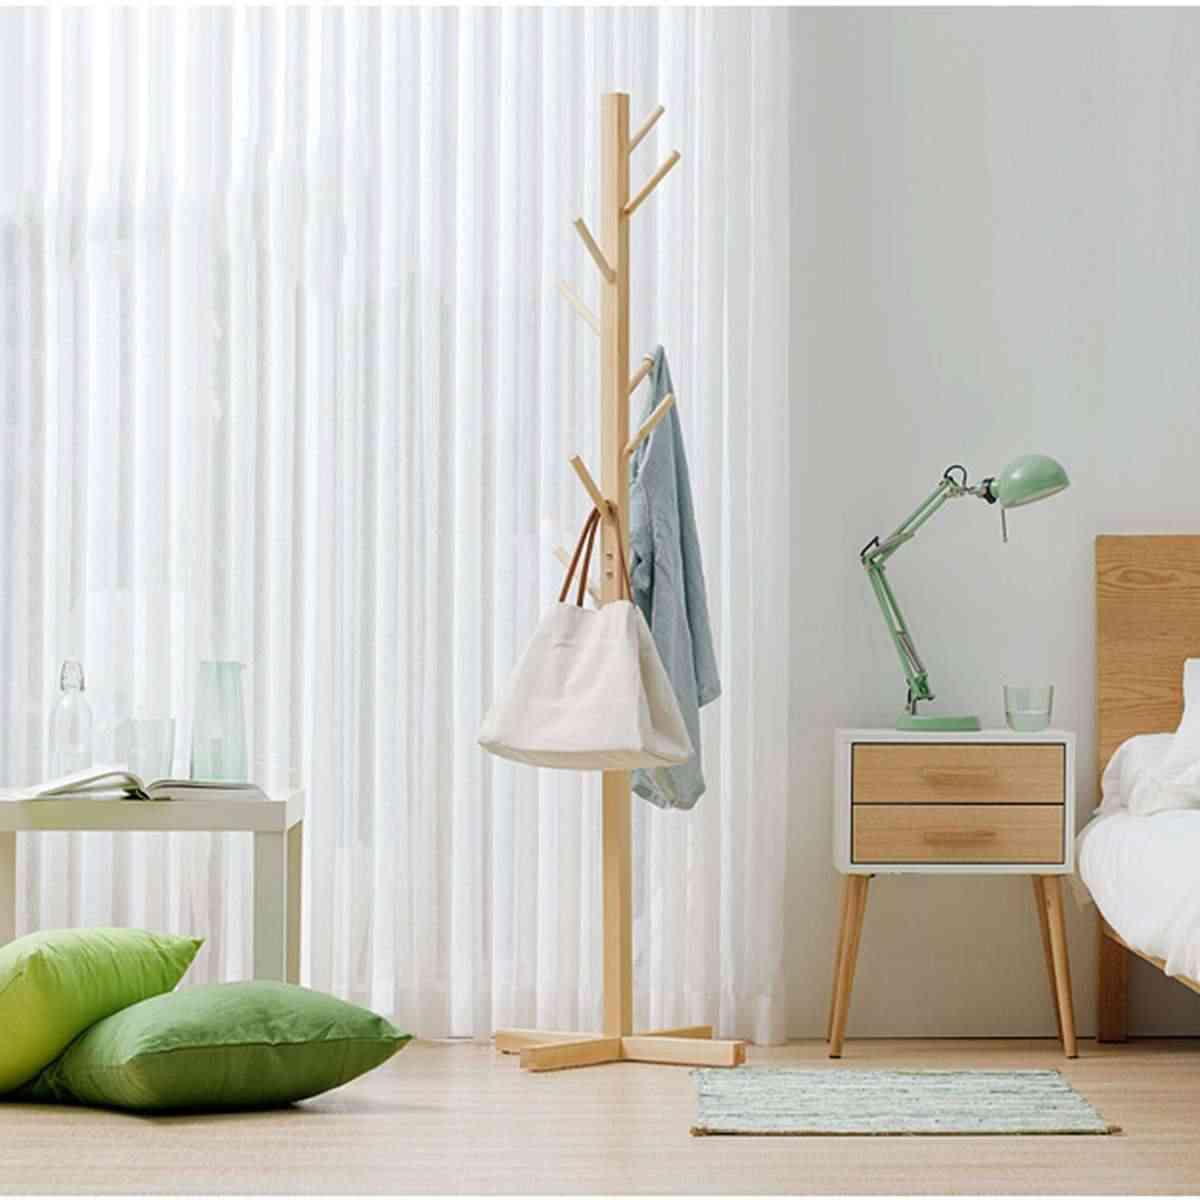 175cm Coat Rack Hanger Hook Wood Hat Cloth Scarve Bag Hanger Floor Standing Living Room Bedroom Furniture Wall White/Brown/Natur